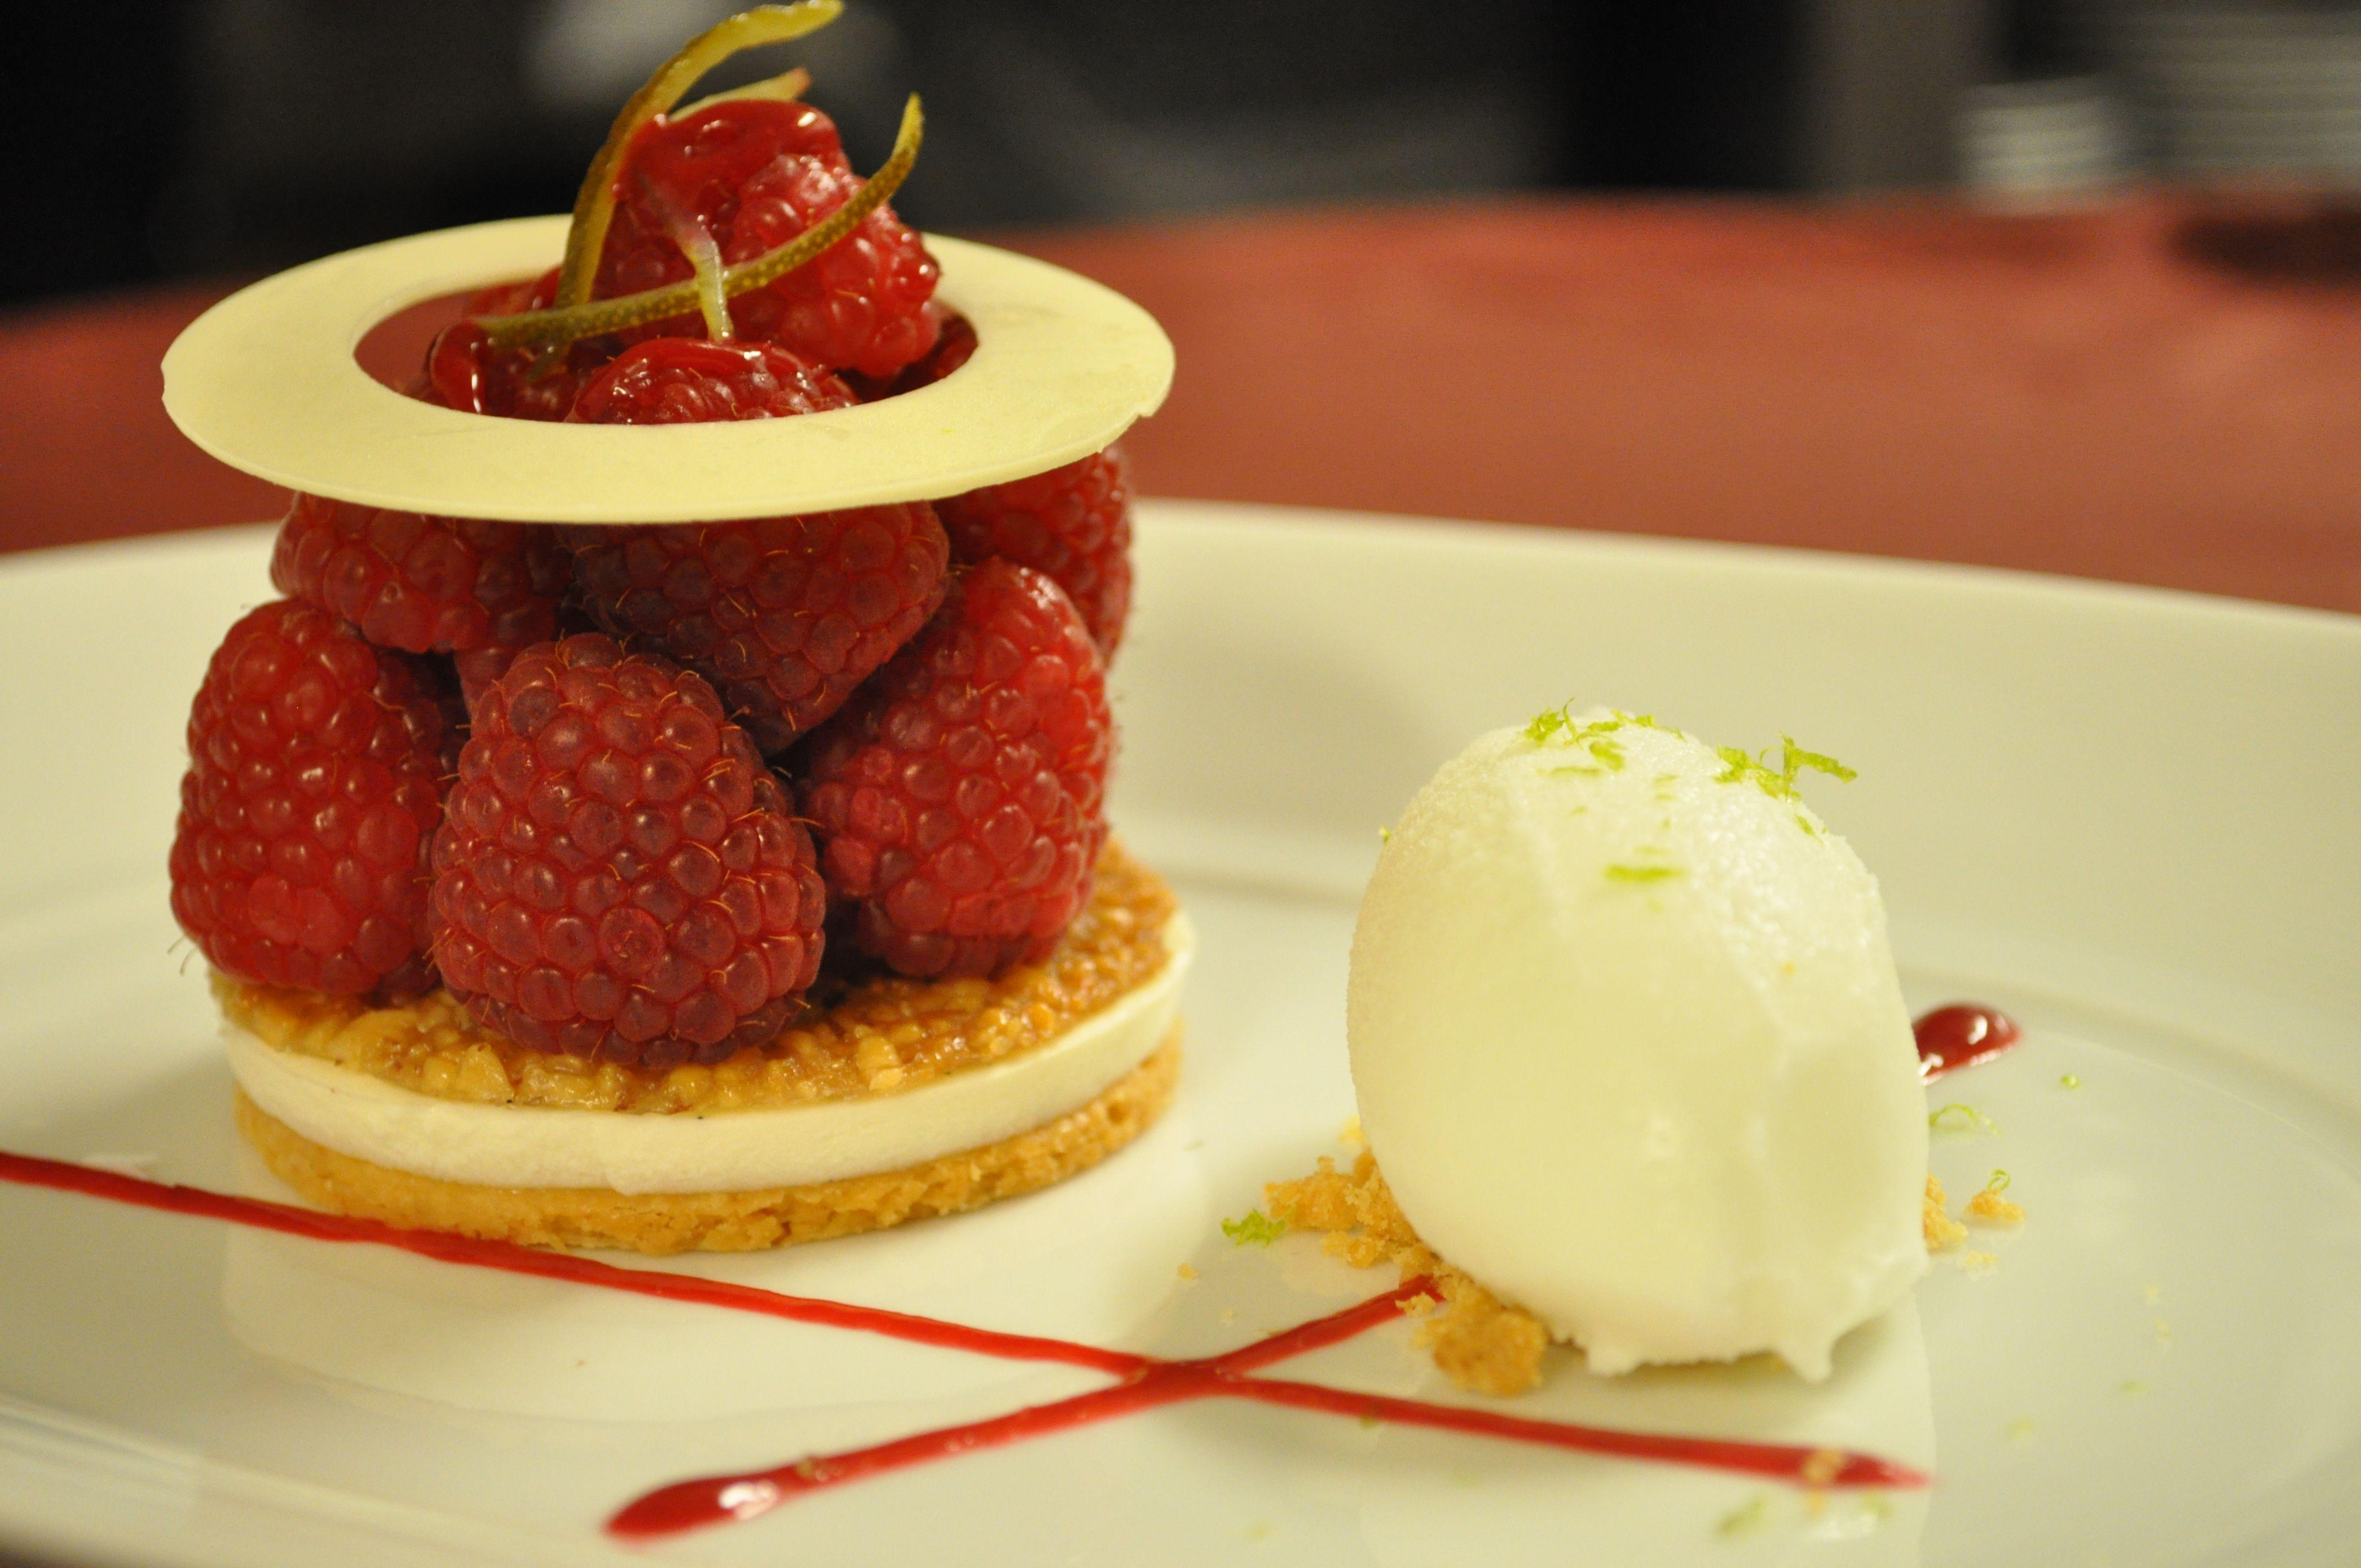 #dessert #fruit #raspberry #sweet